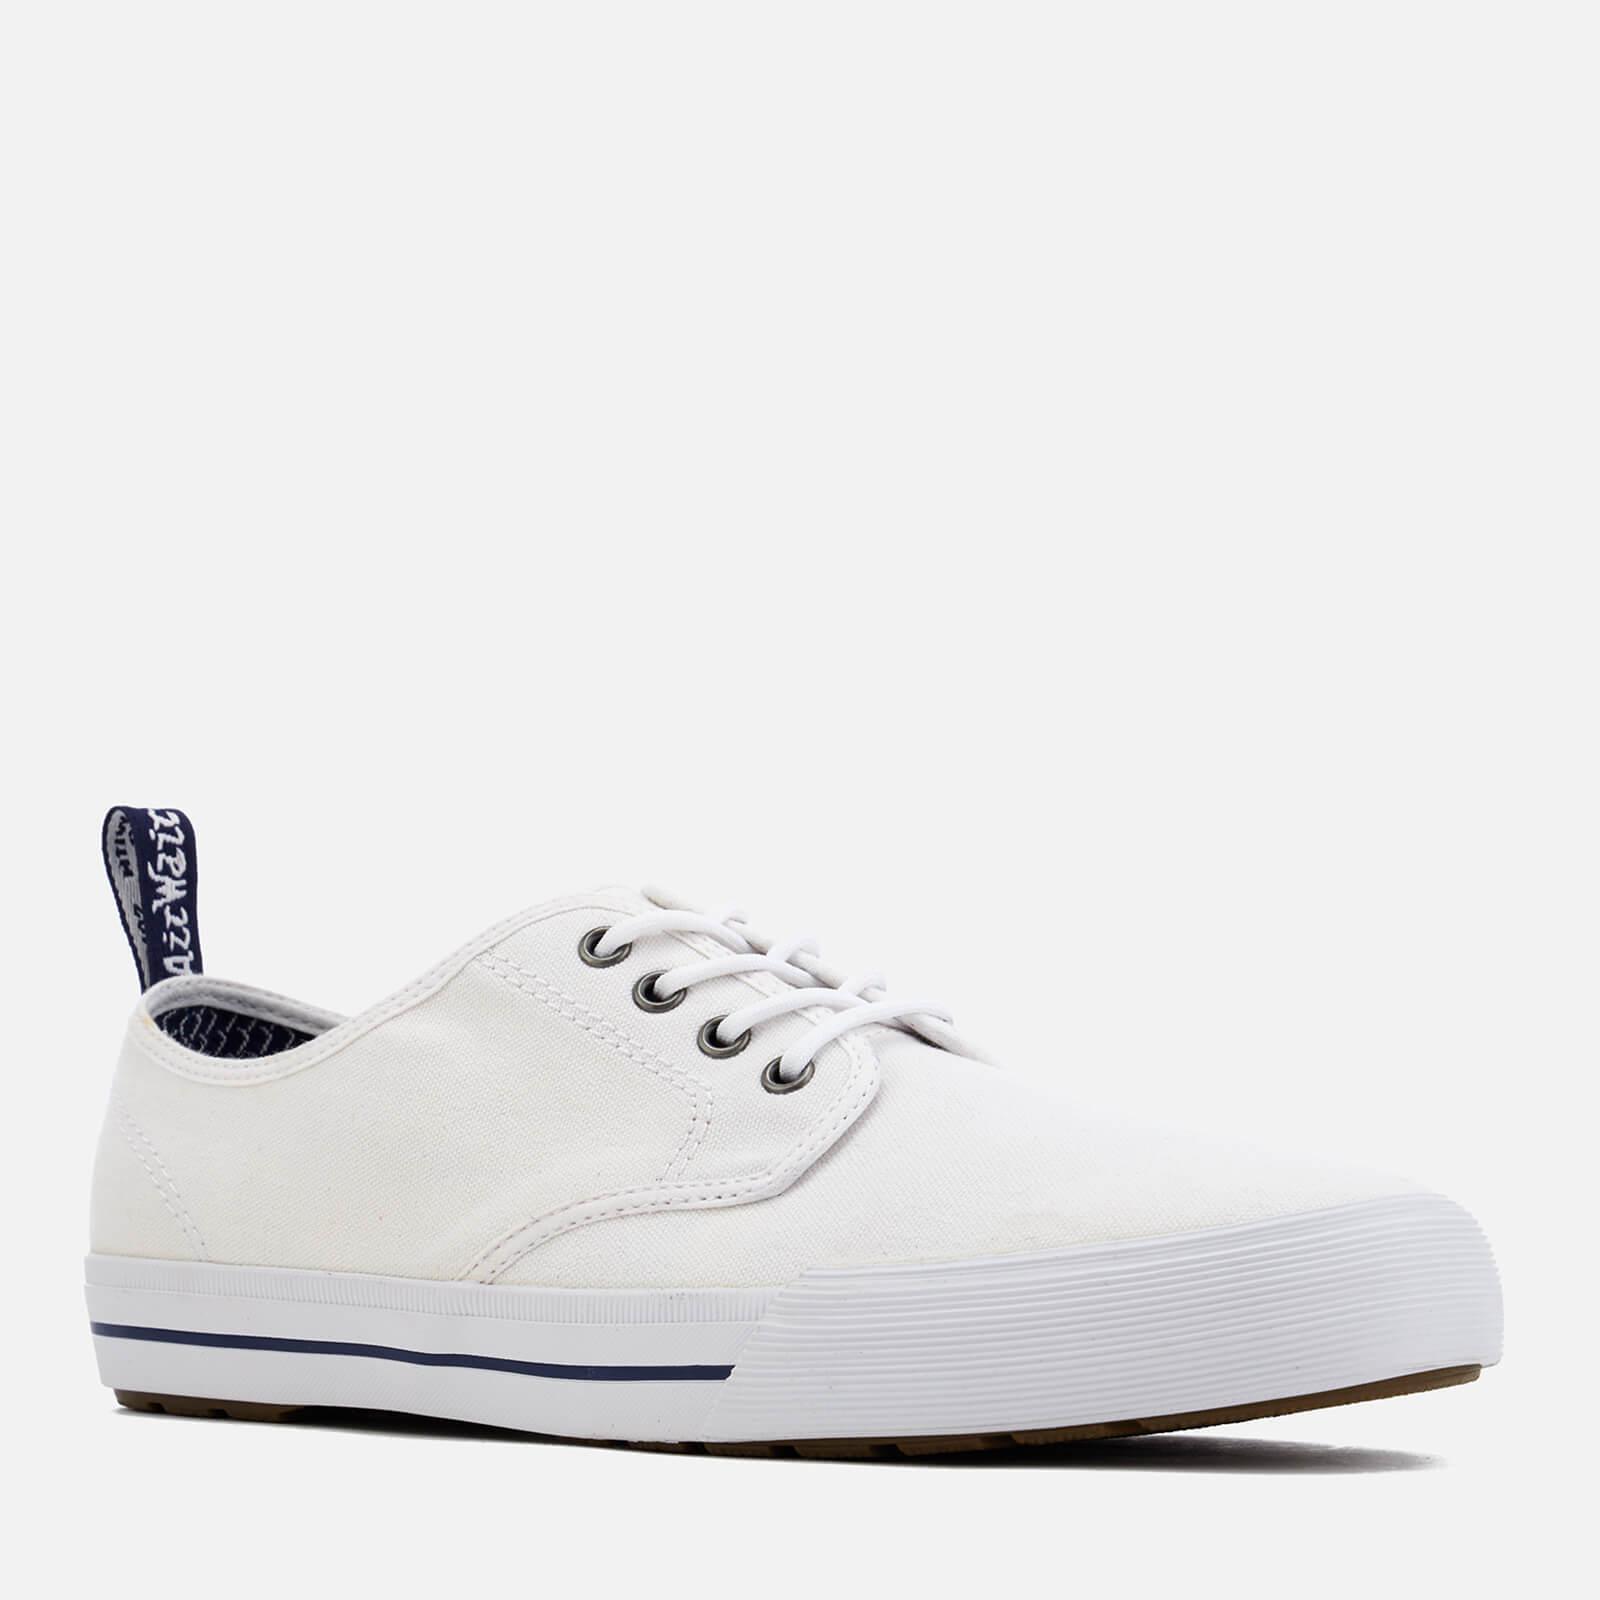 eb4fee17 Dr. Martens - White Pressler Canvas Lace Shoes for Men - Lyst. View  fullscreen